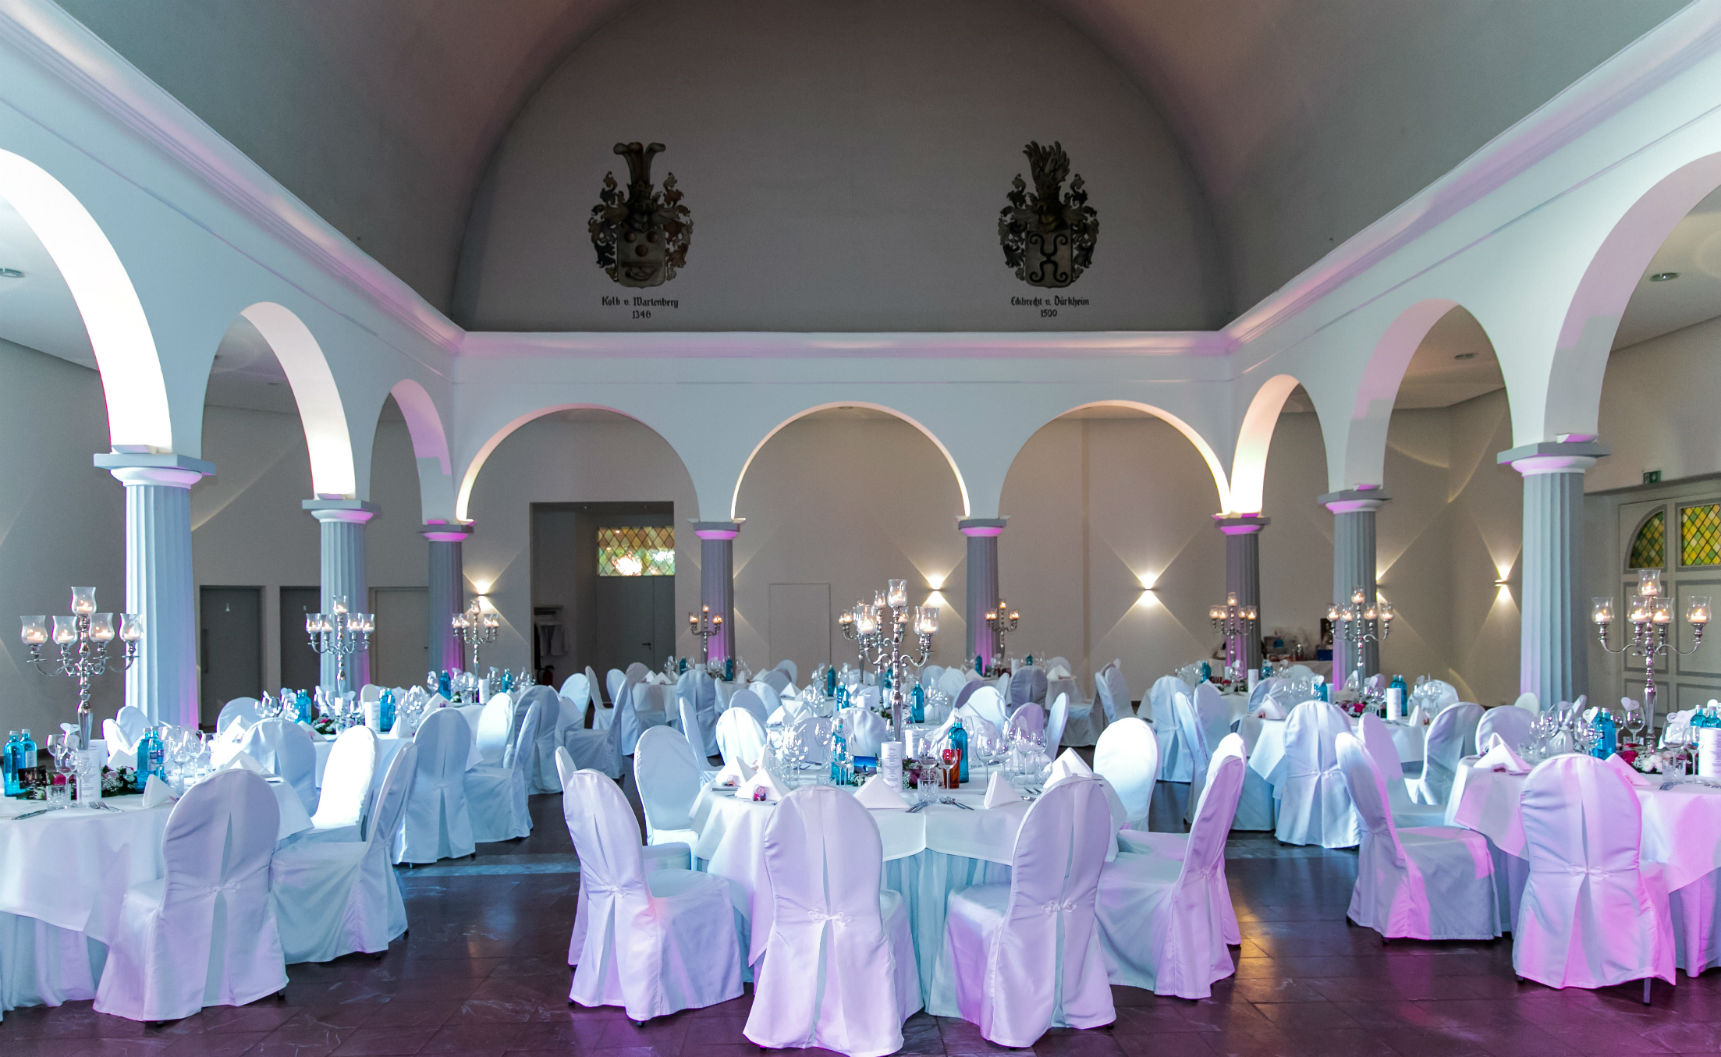 Der Marmorsaal der Sektkellerei Schloss Wachenheim